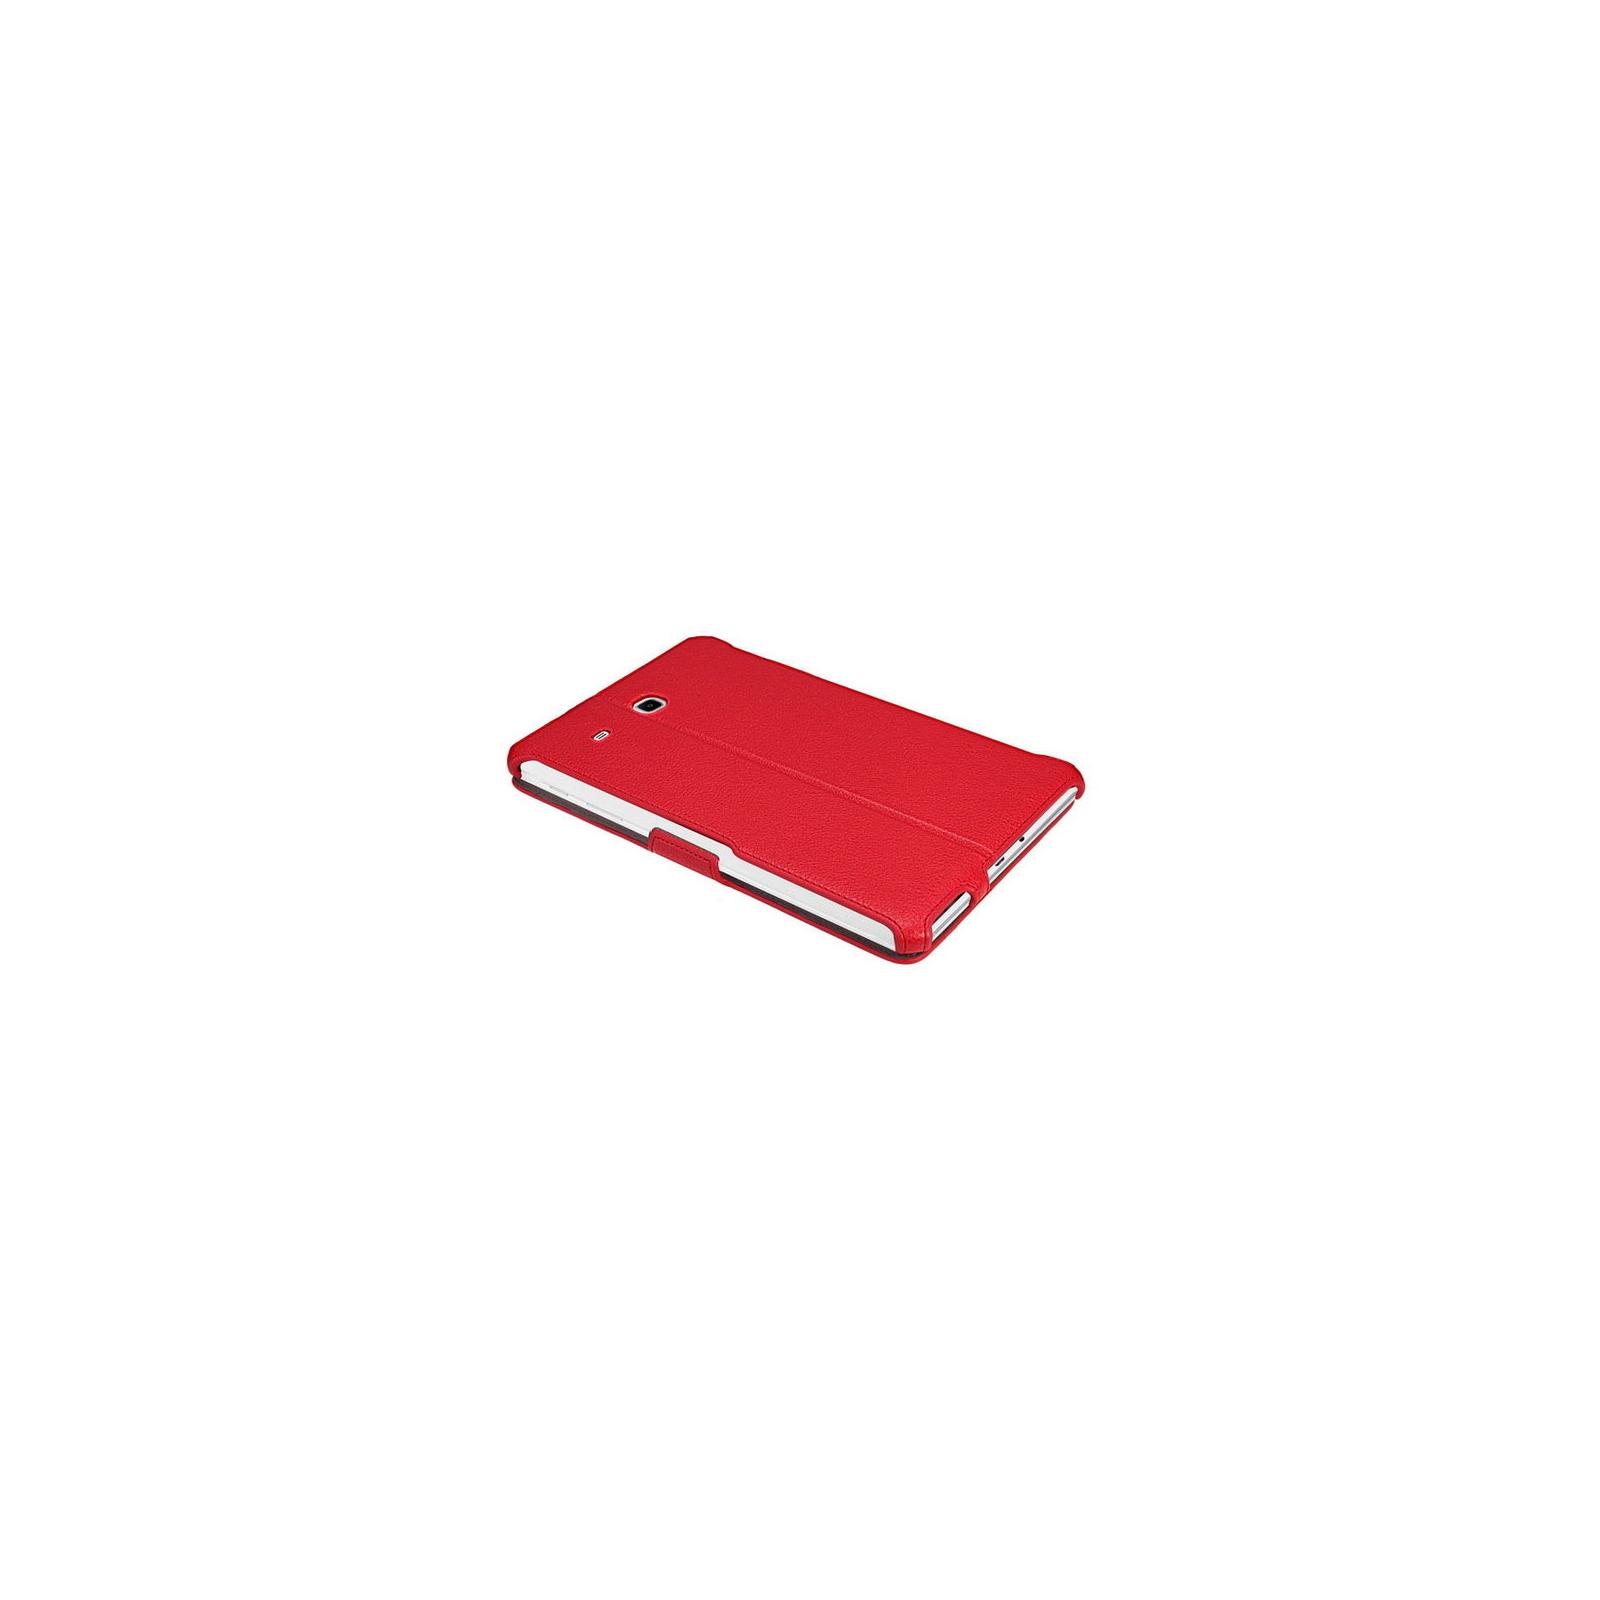 Чехол для планшета AirOn для Samsung Galaxy Tab E 9.6 red (4822352777258) изображение 4